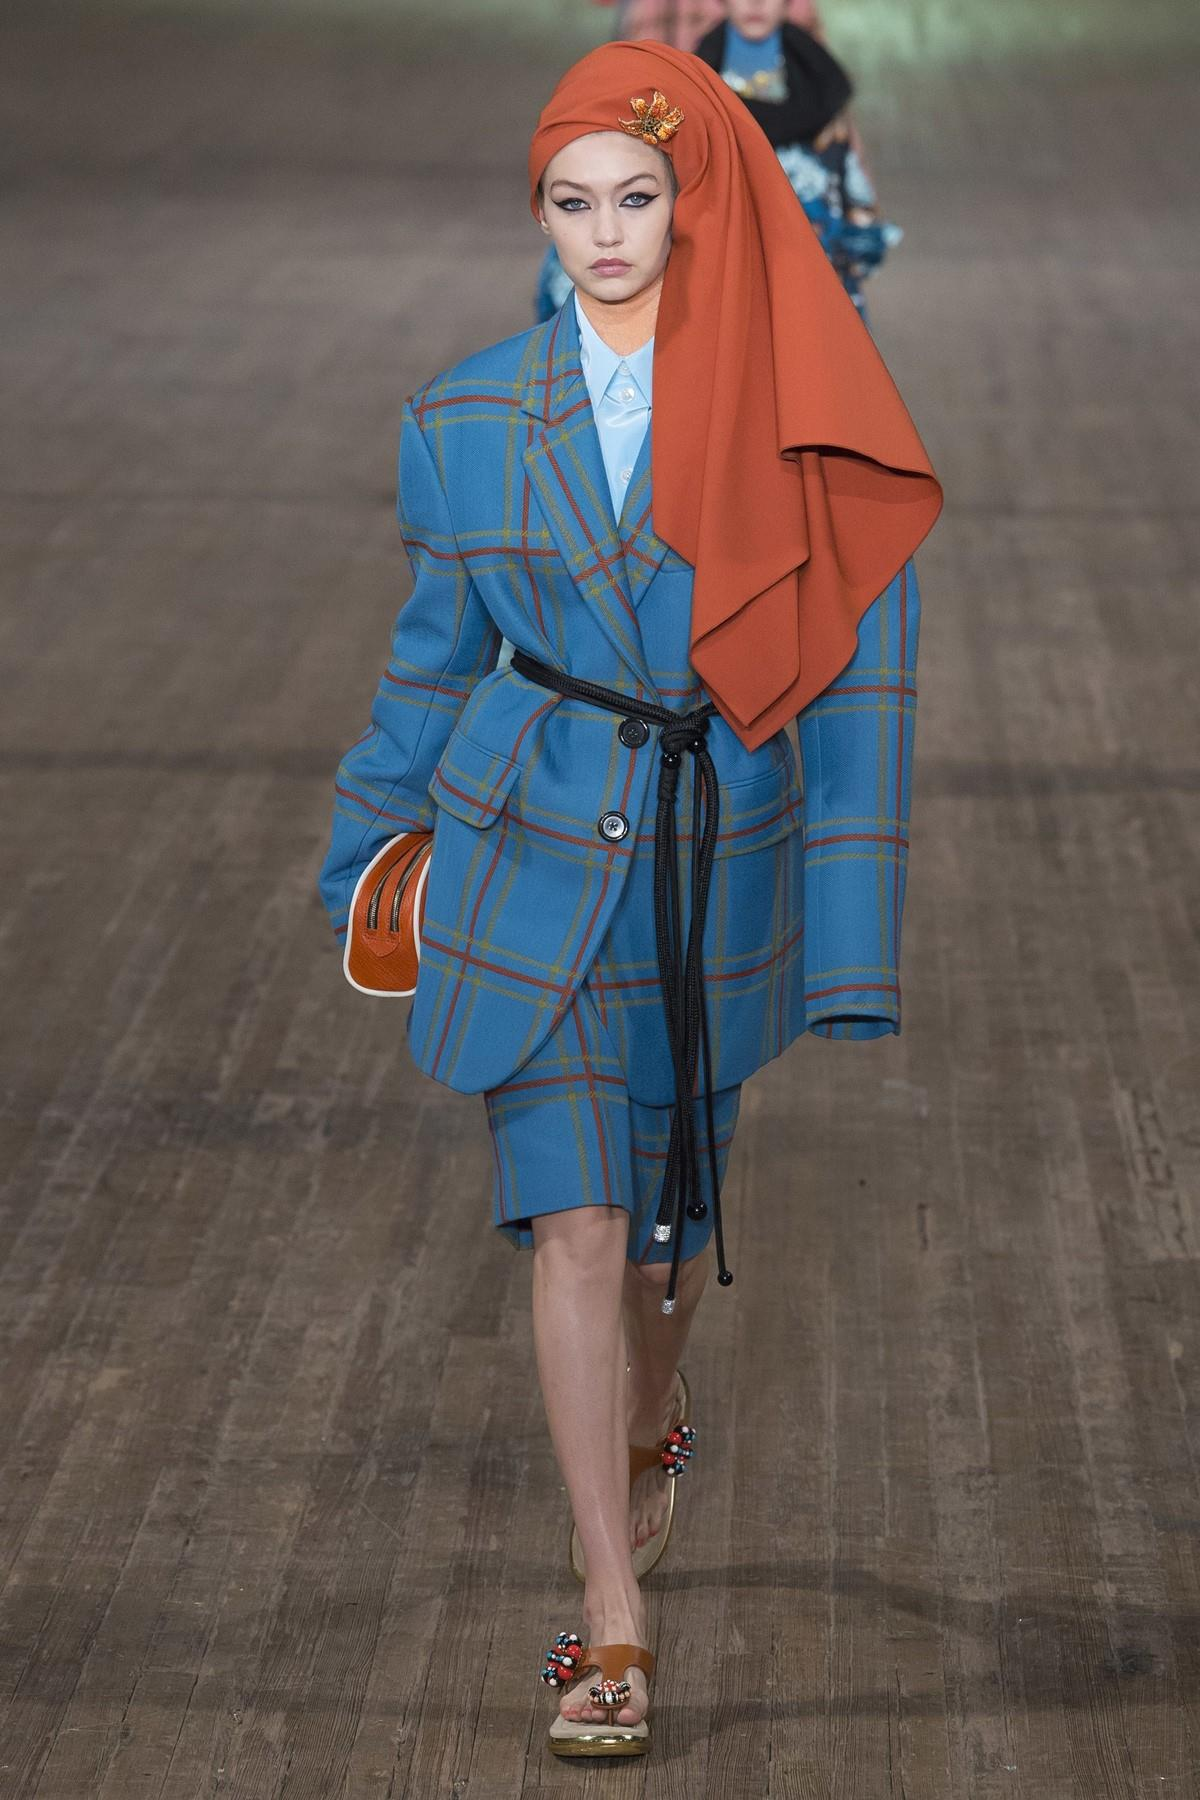 مارک جیکوبز طراح لباس